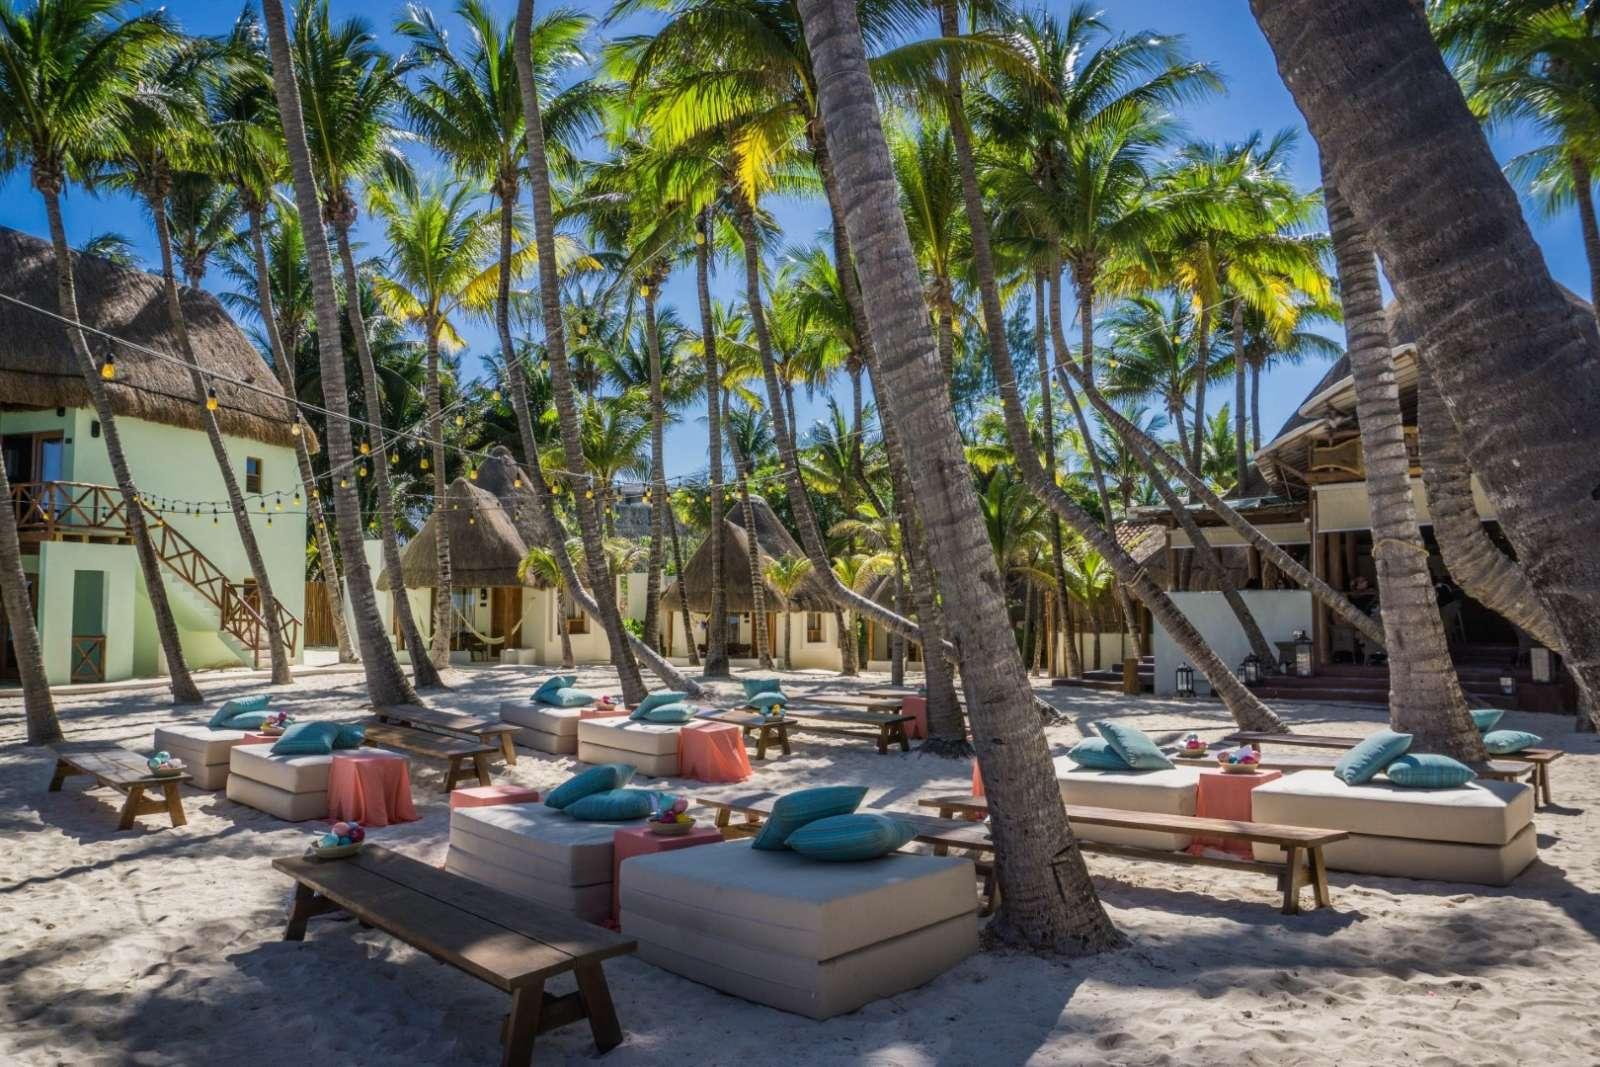 Beach beds at Mahekal Beach Resort